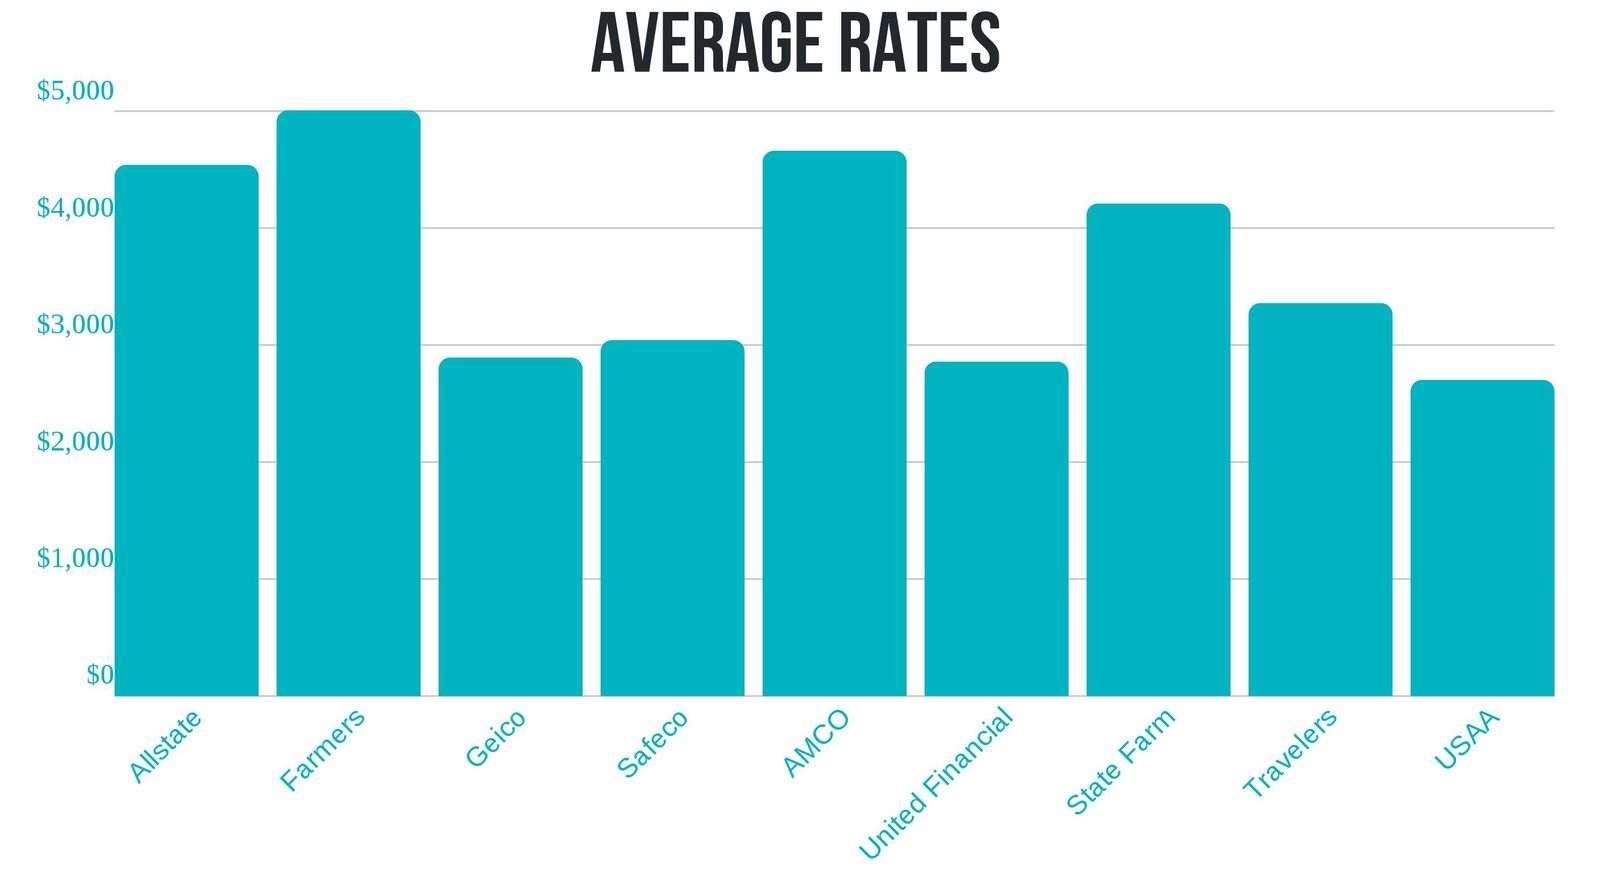 Average Car Insurance Rates in California